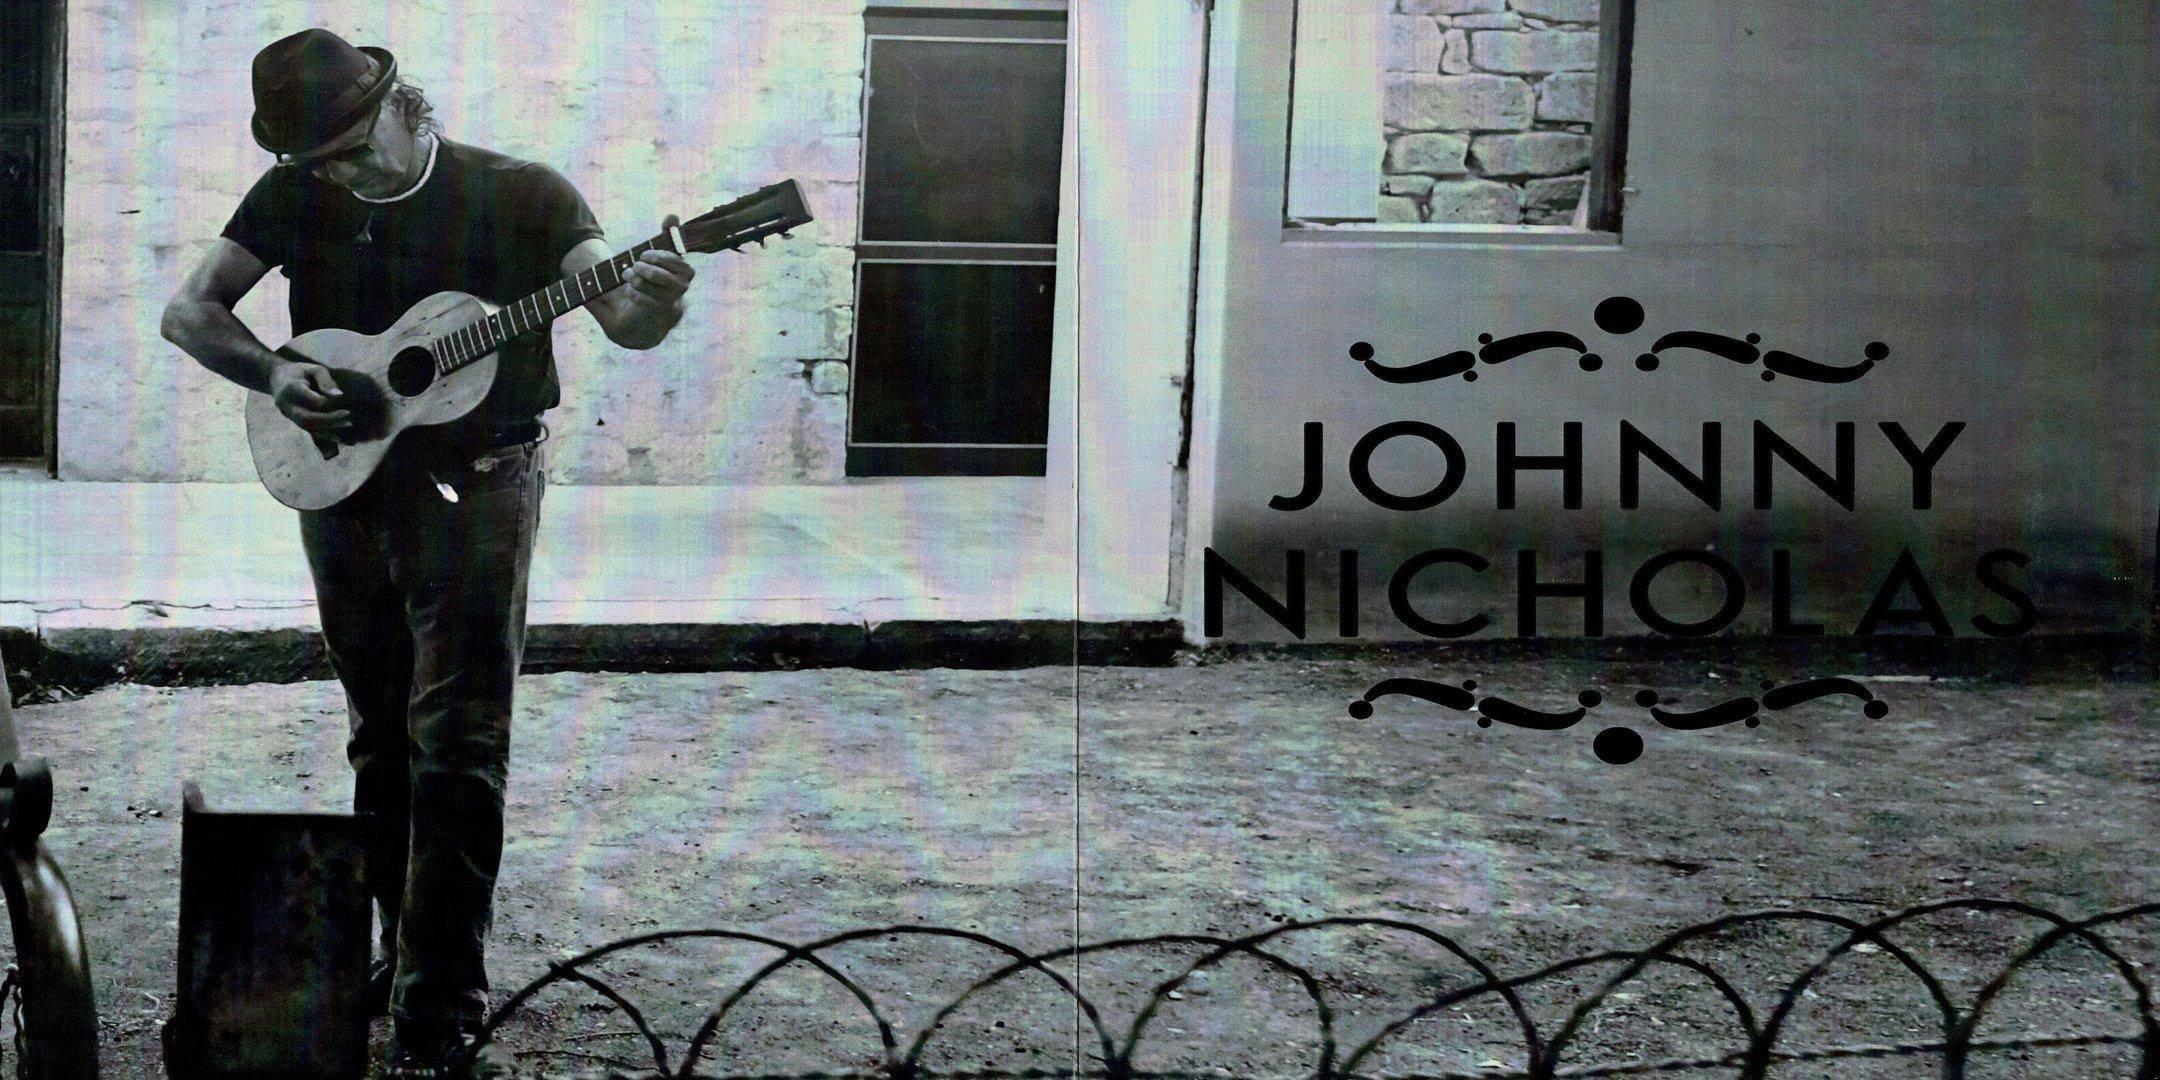 JohnnyNicholas.jpg